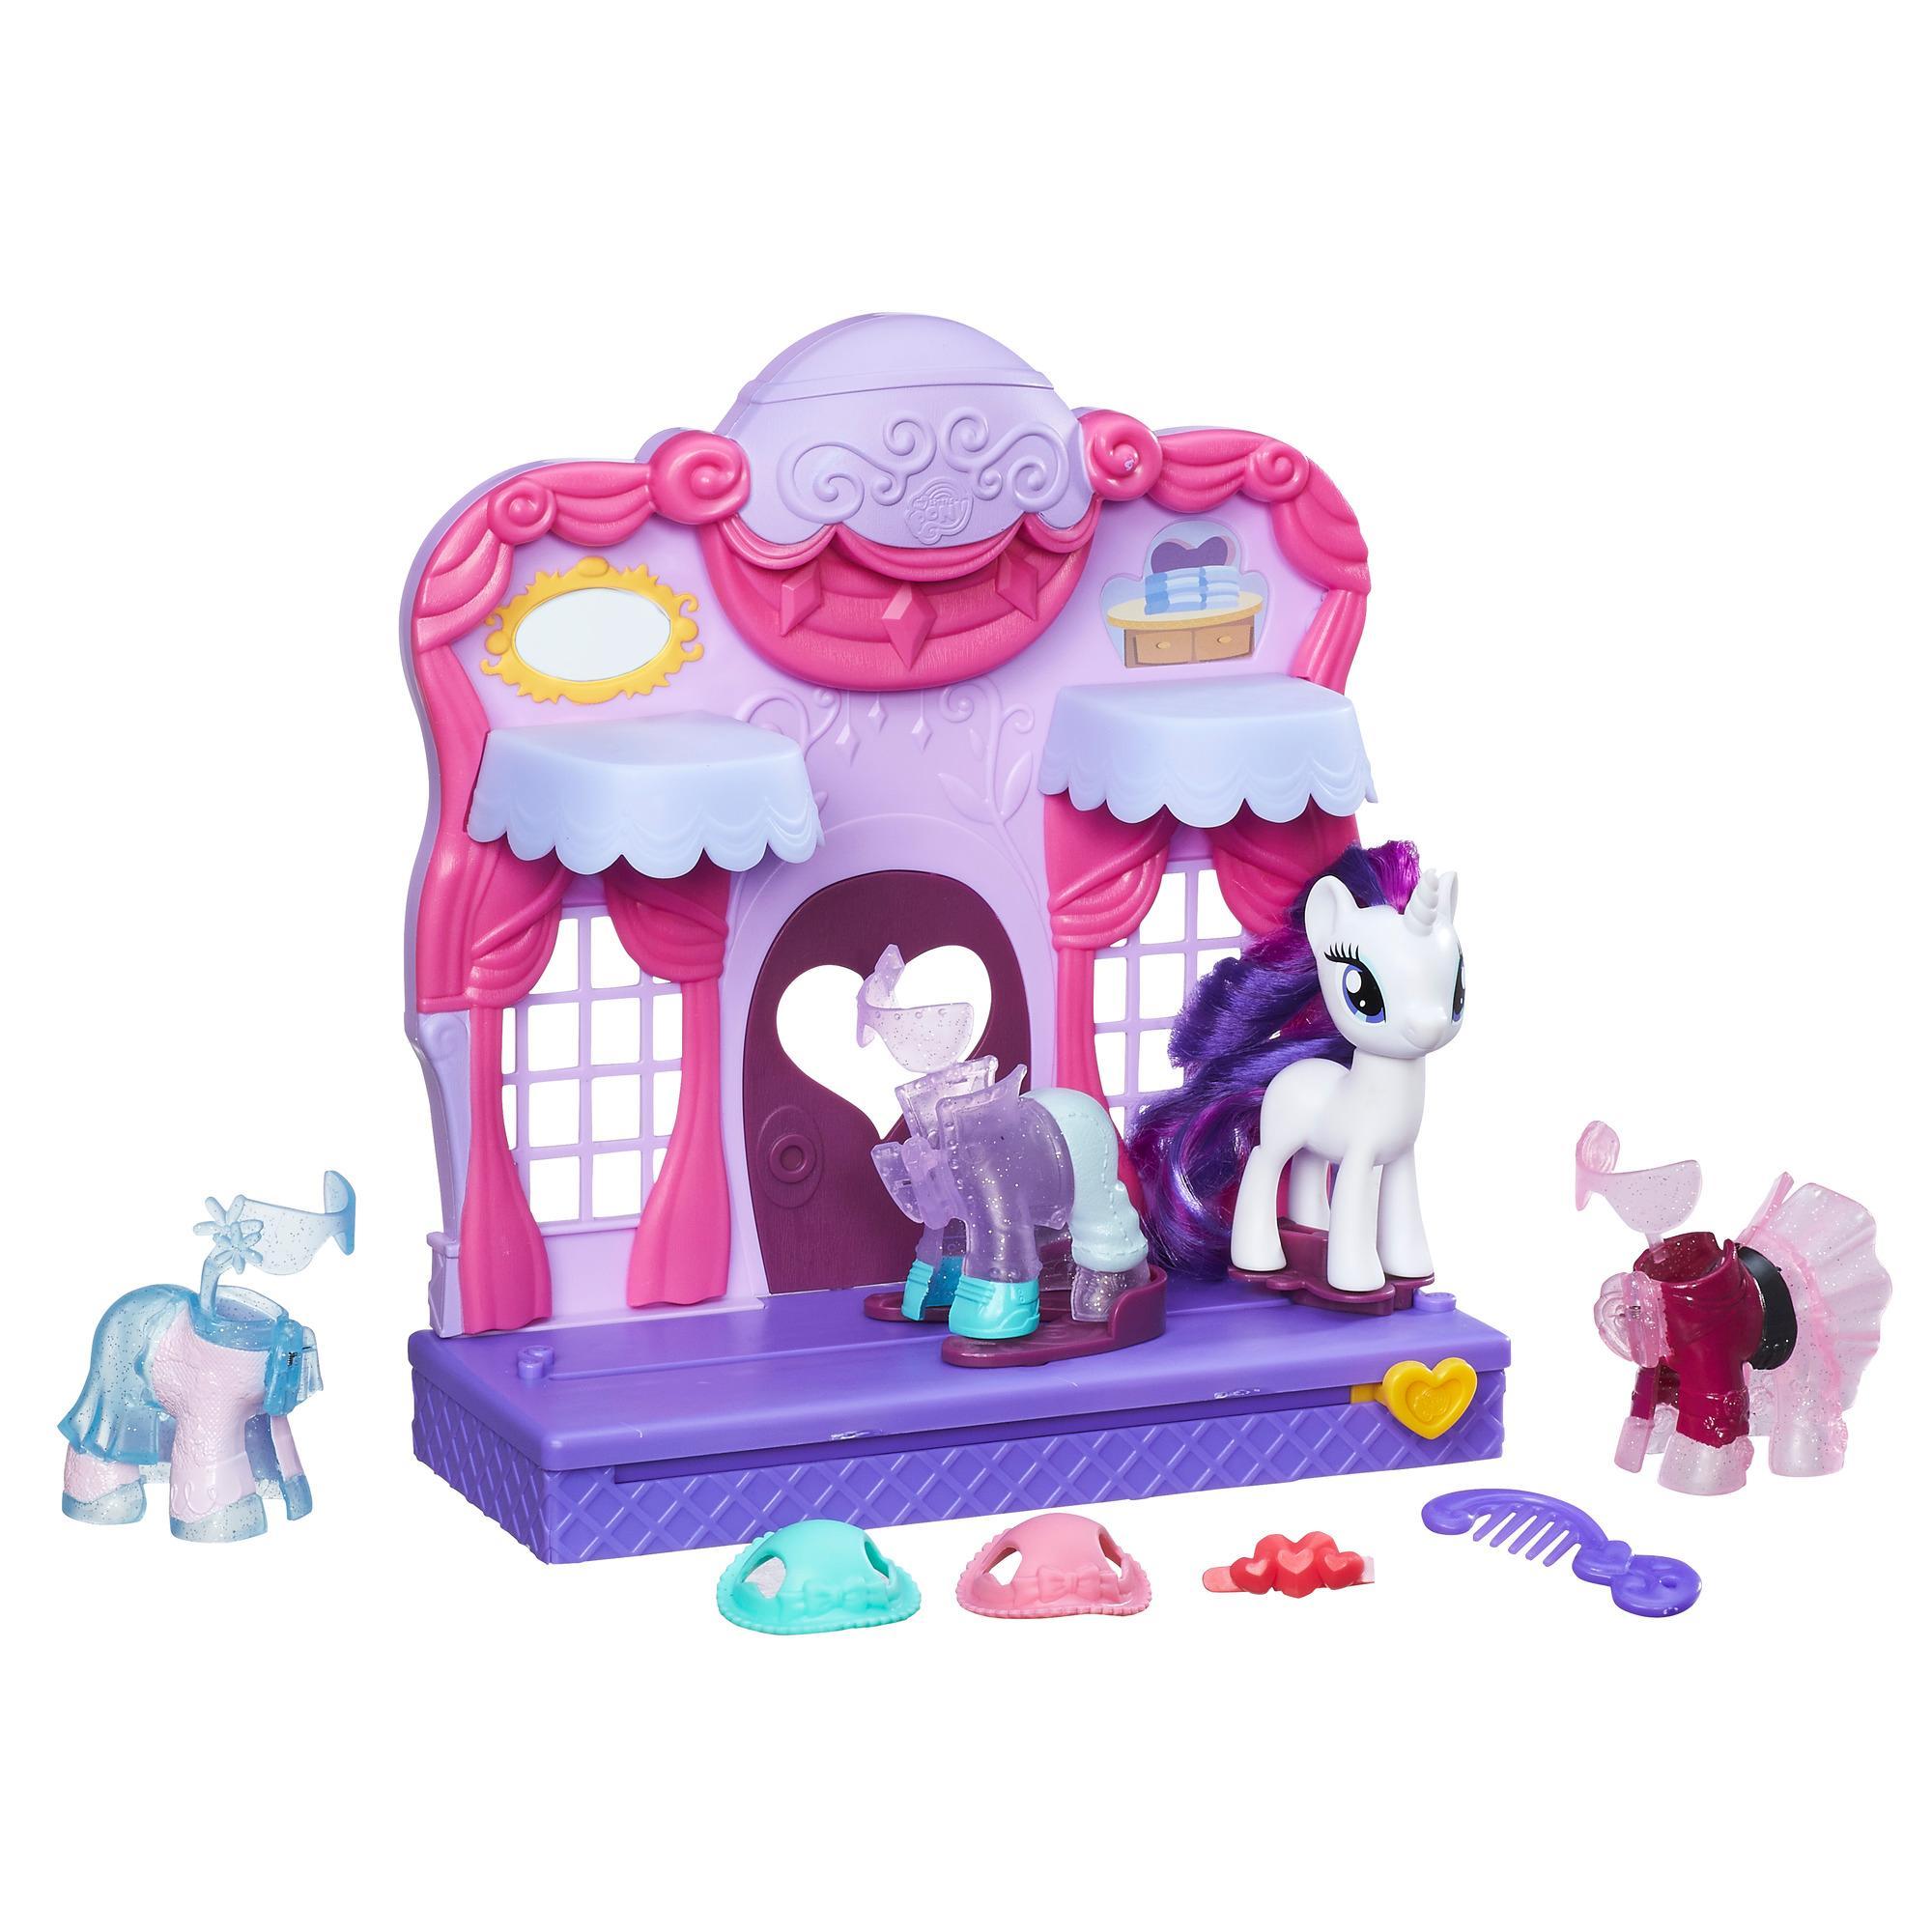 My Little Pony Friendship is Magic Rarity® Fashion Runway Playset